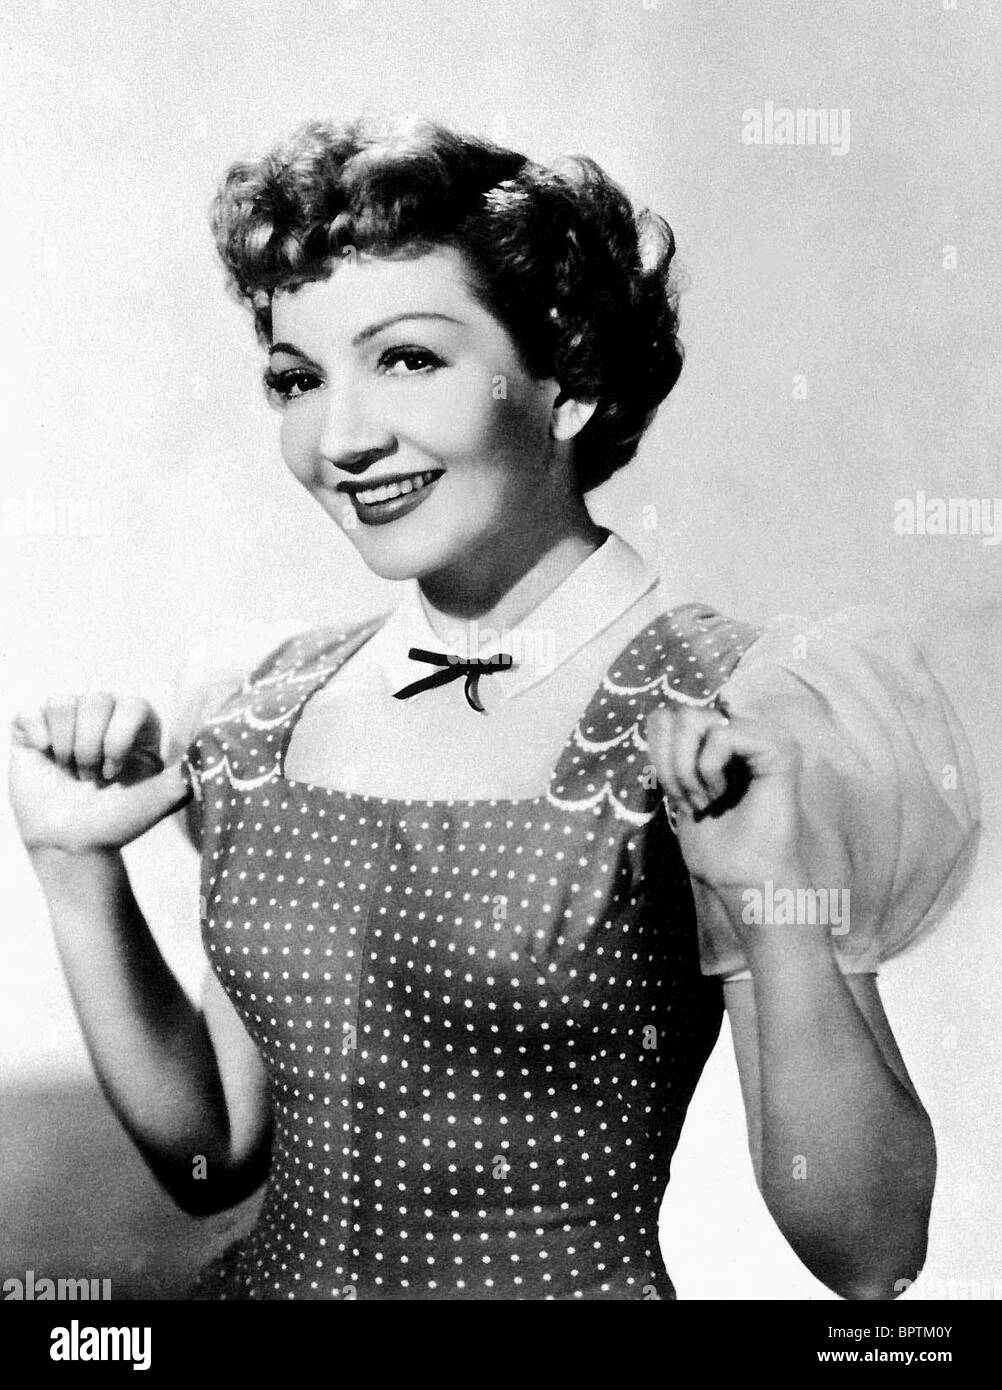 CLAUDETTE COLBERT ACTRESS (1940) - Stock Image